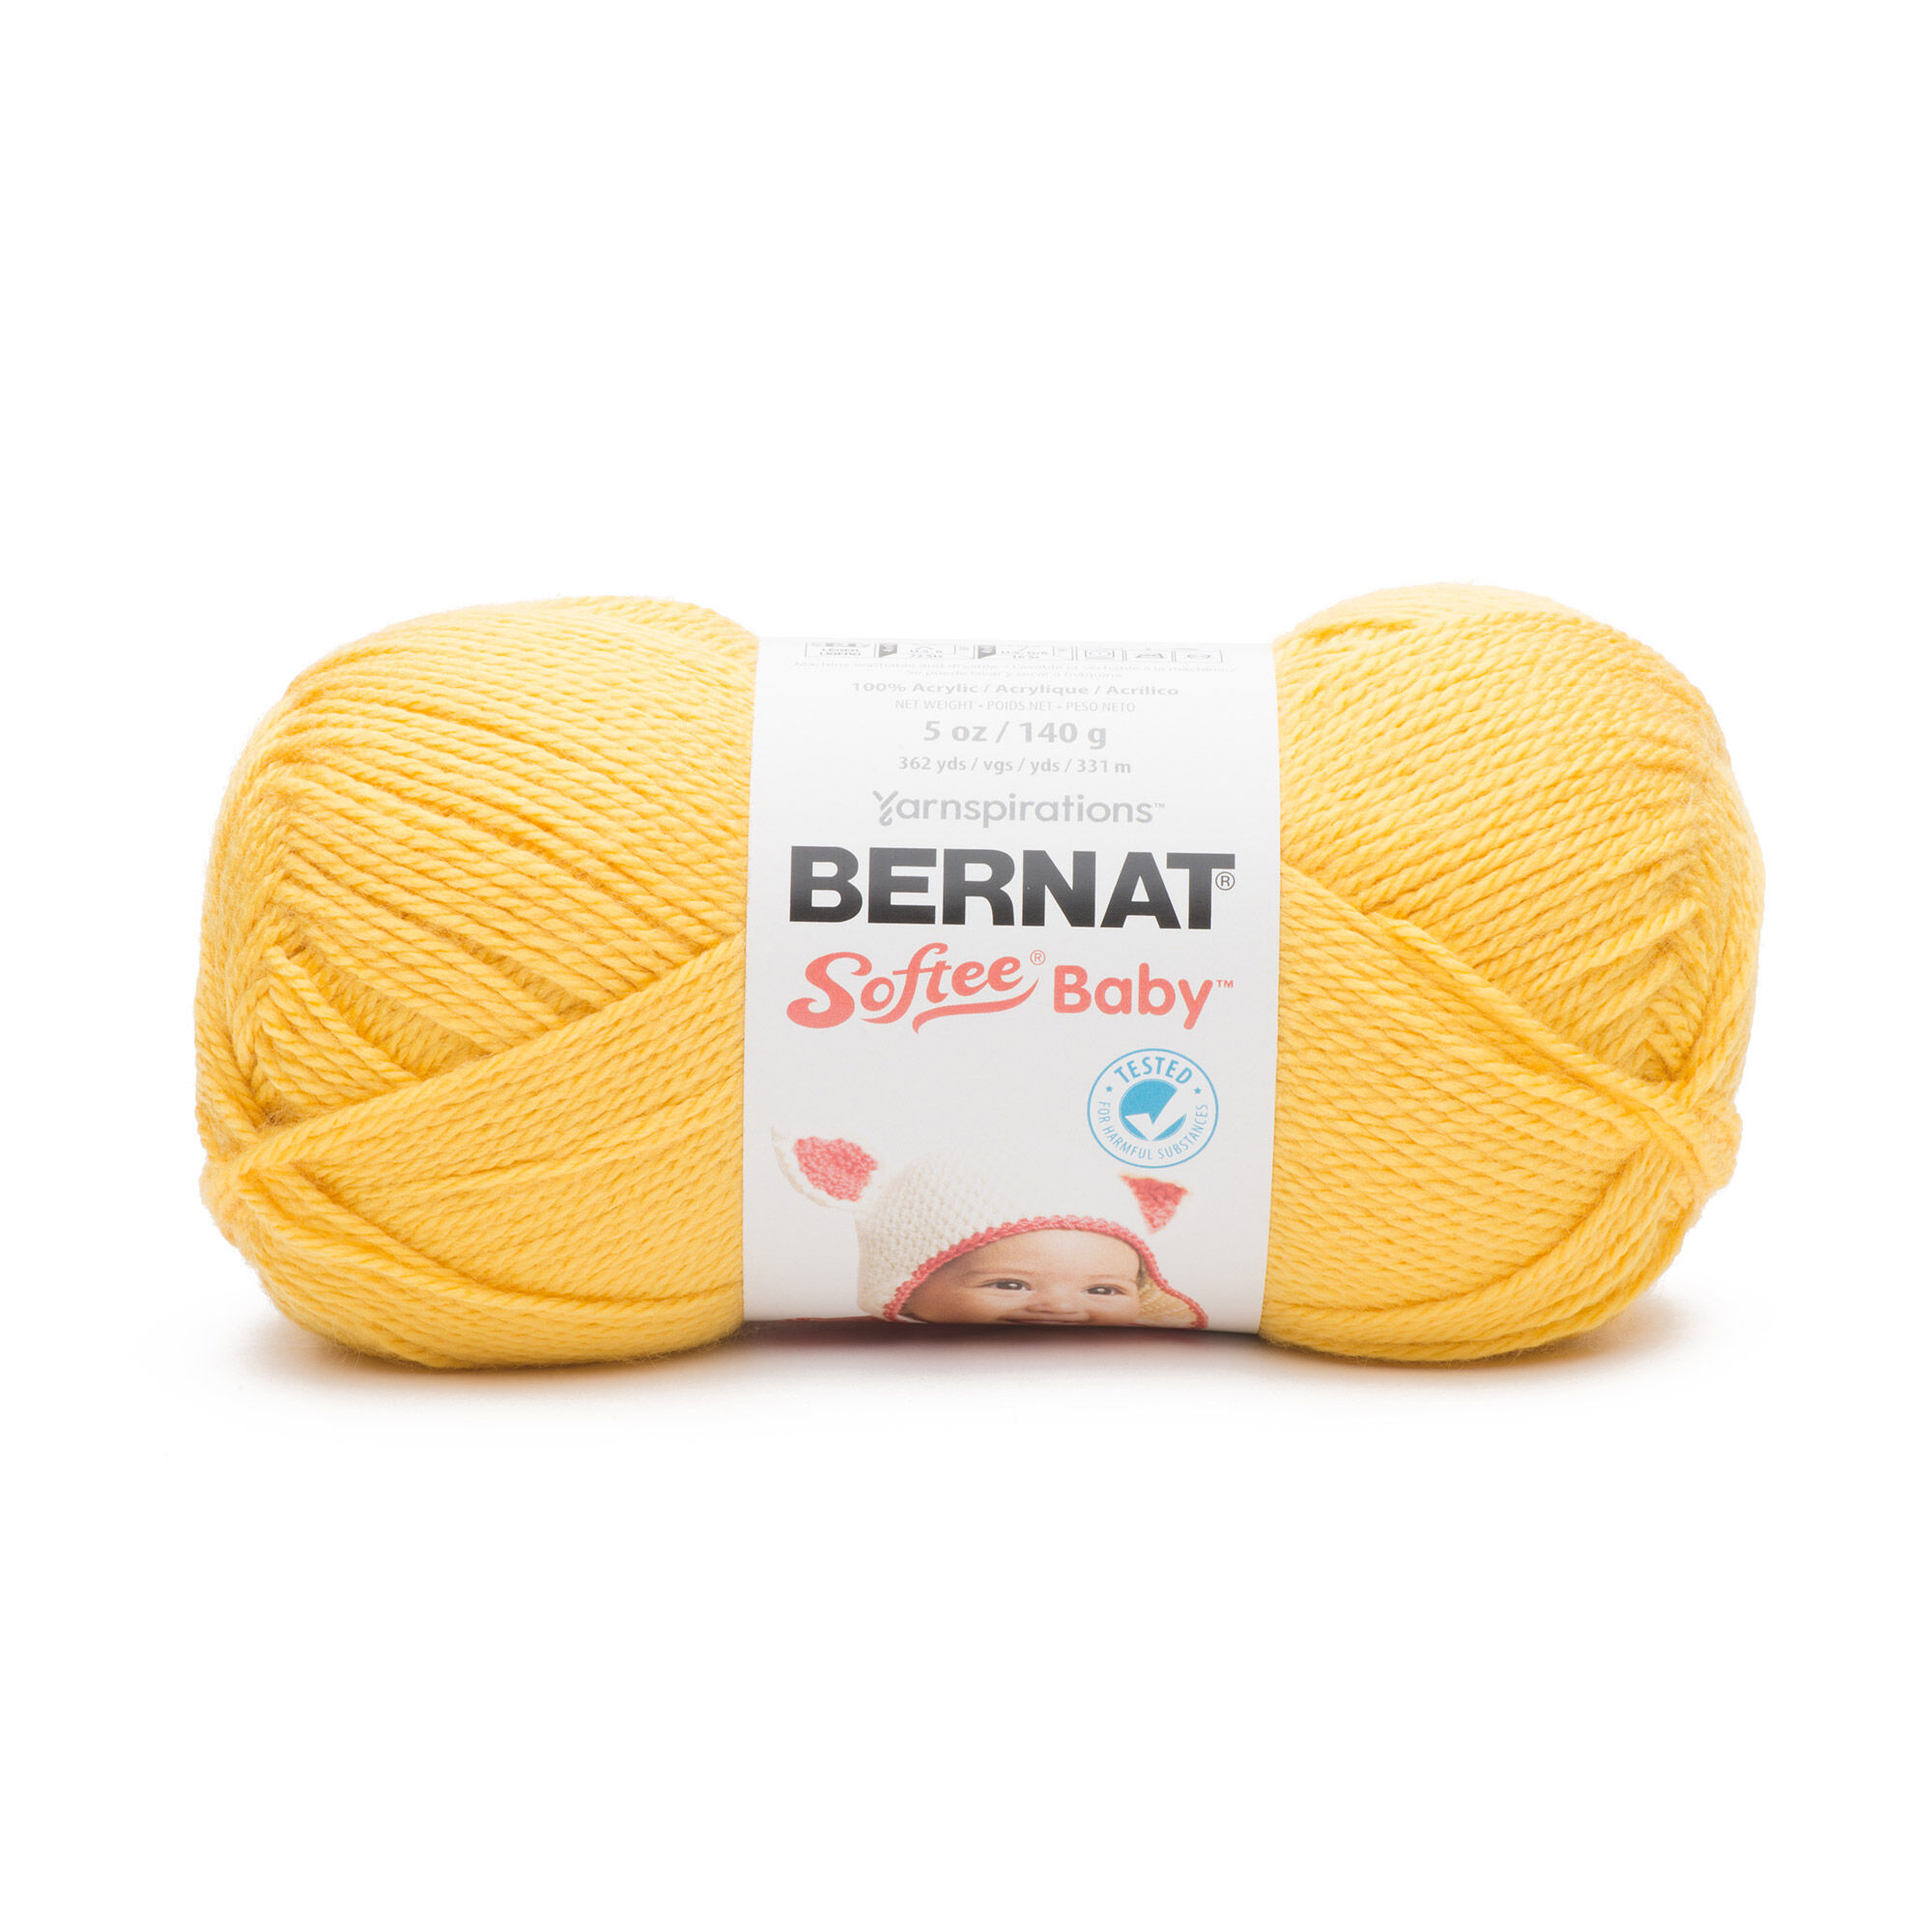 Bernat Softee Baby Yarn Buttercup Yarnspirations